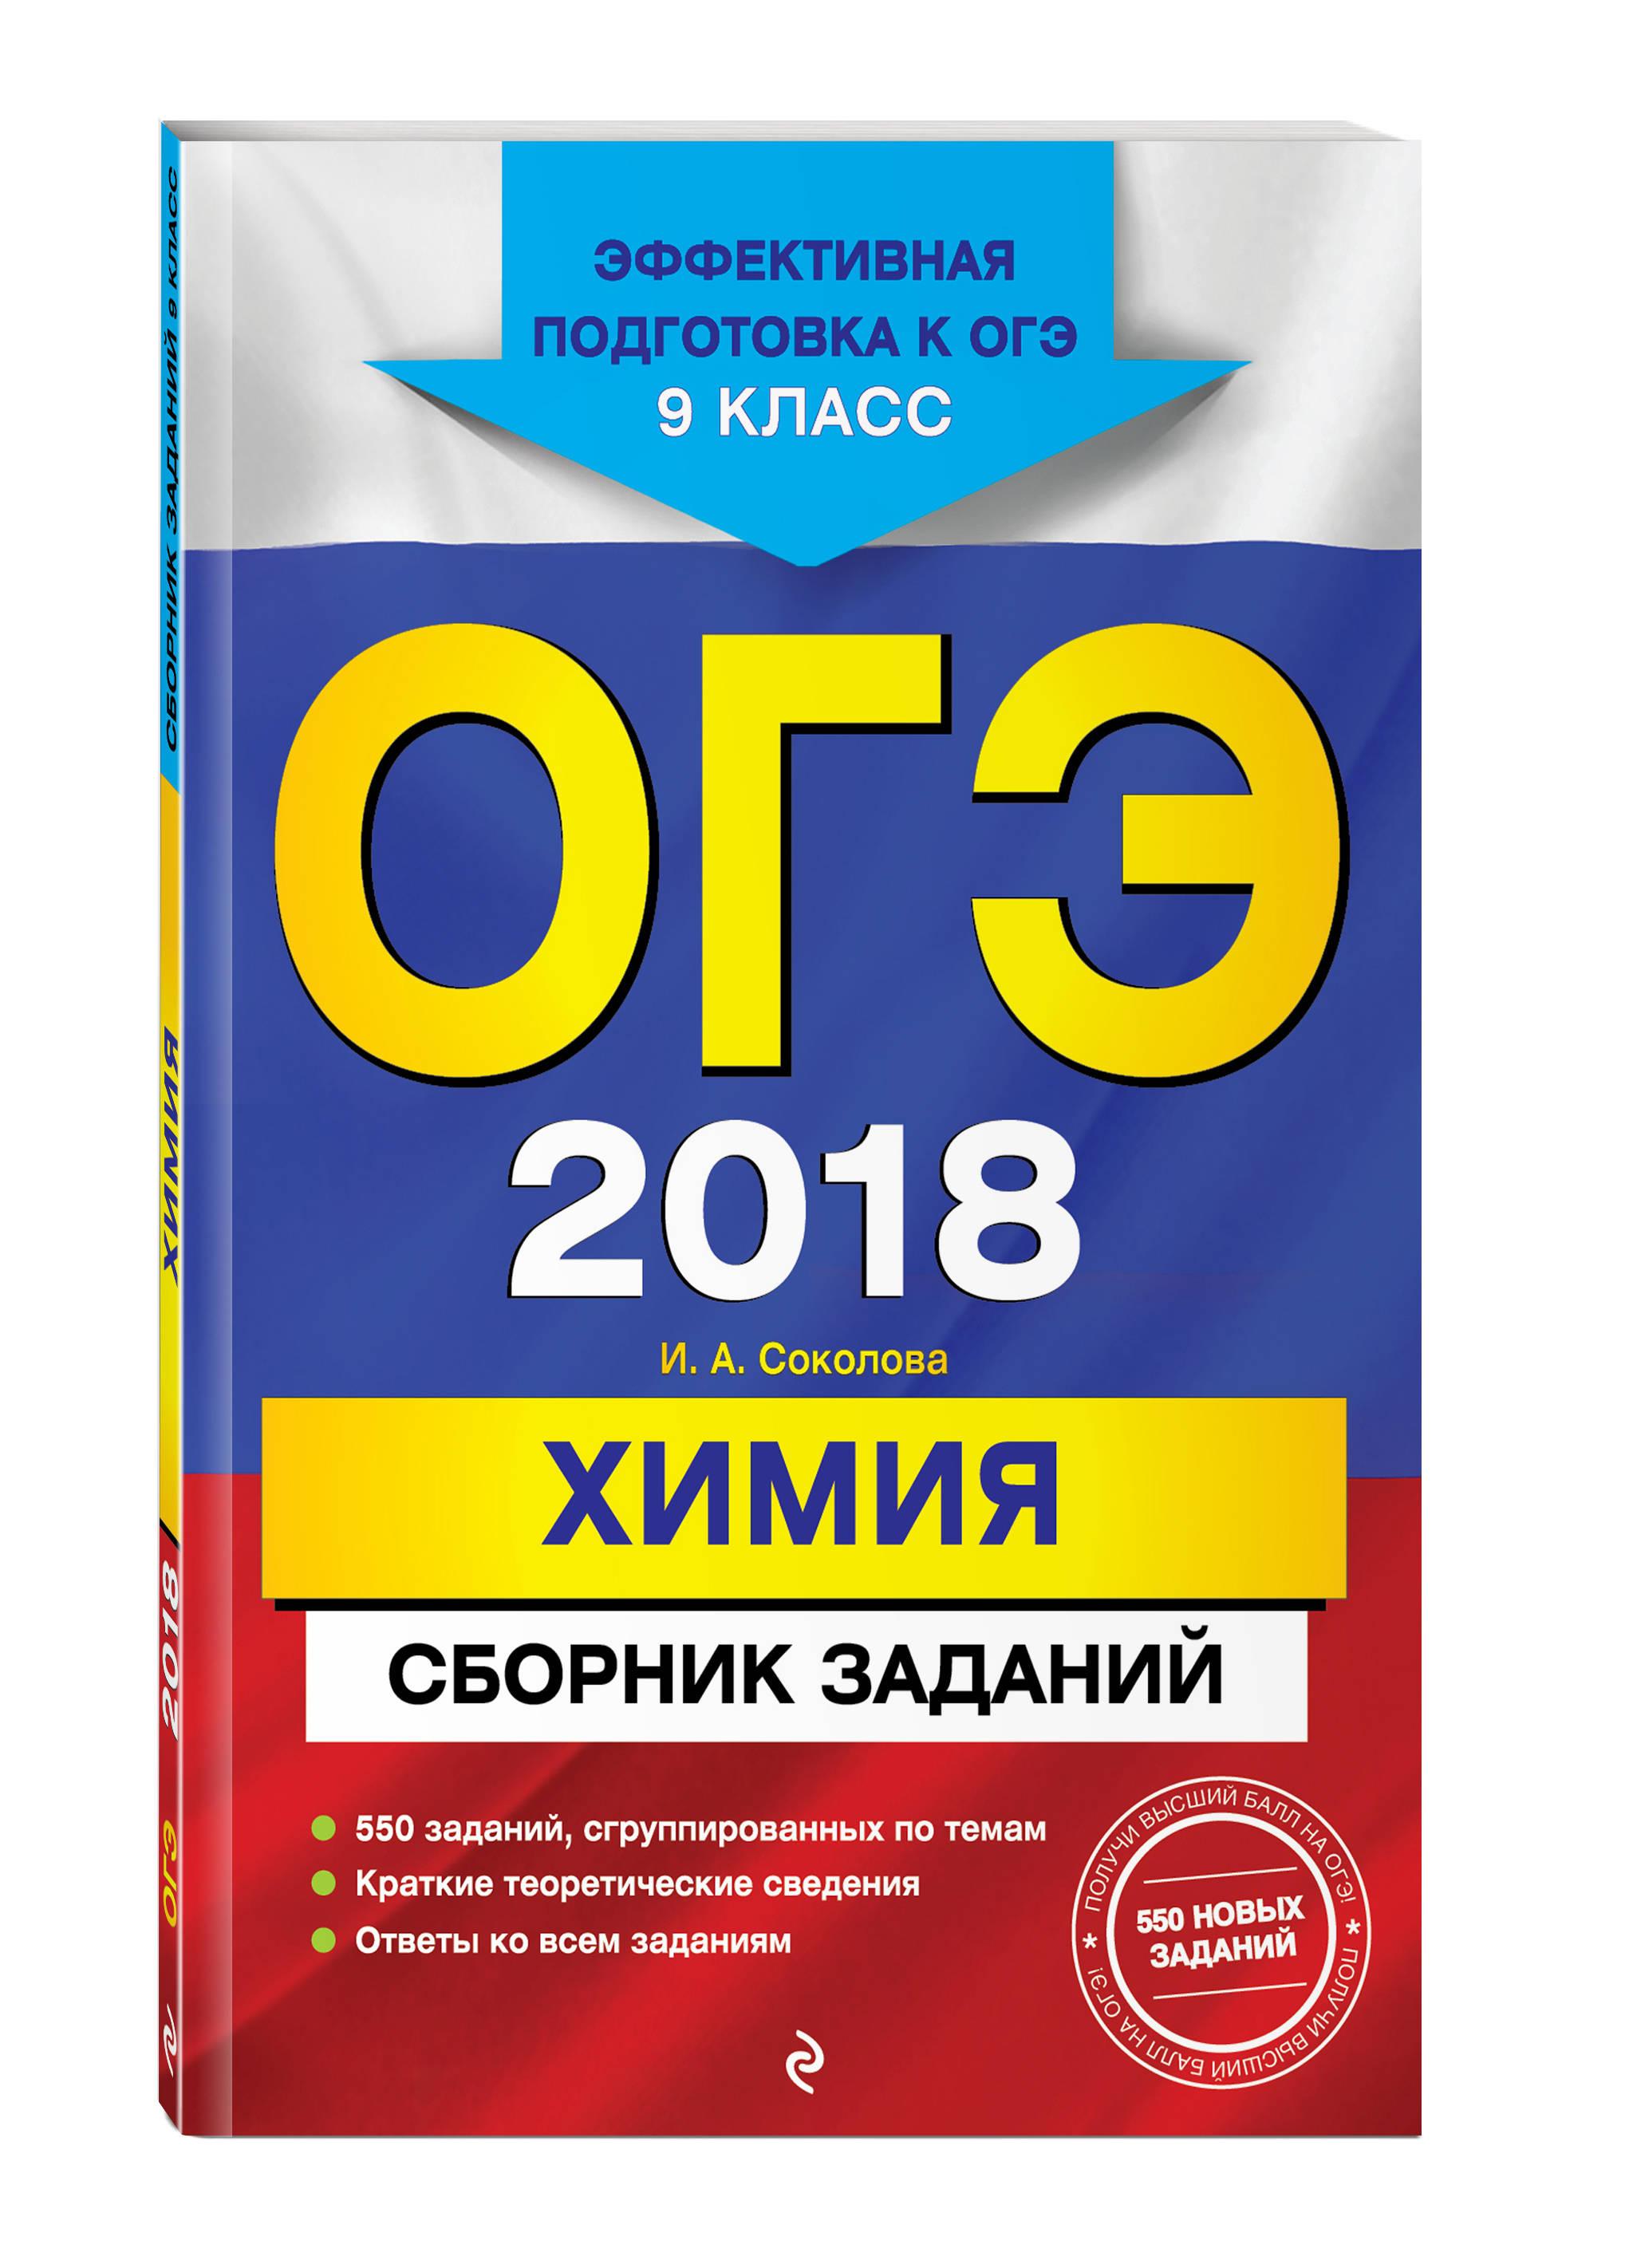 2018 5 класс гдз 2018